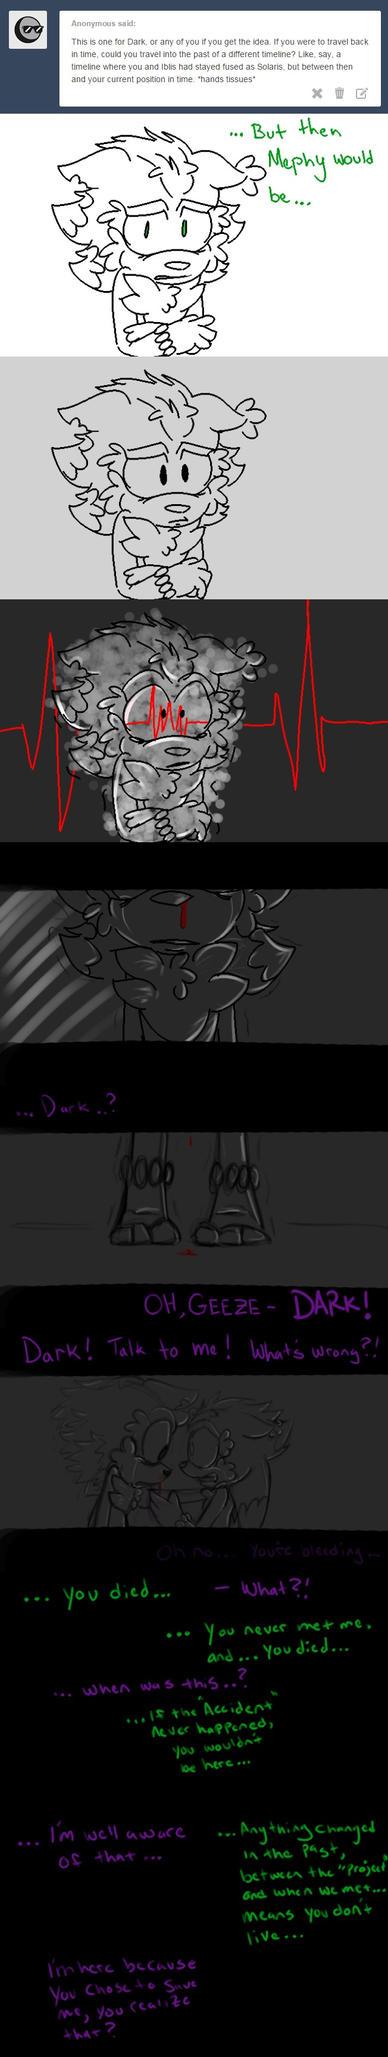 Crystal Hedgehog Boys - Alternate Timelines by RaeLogan